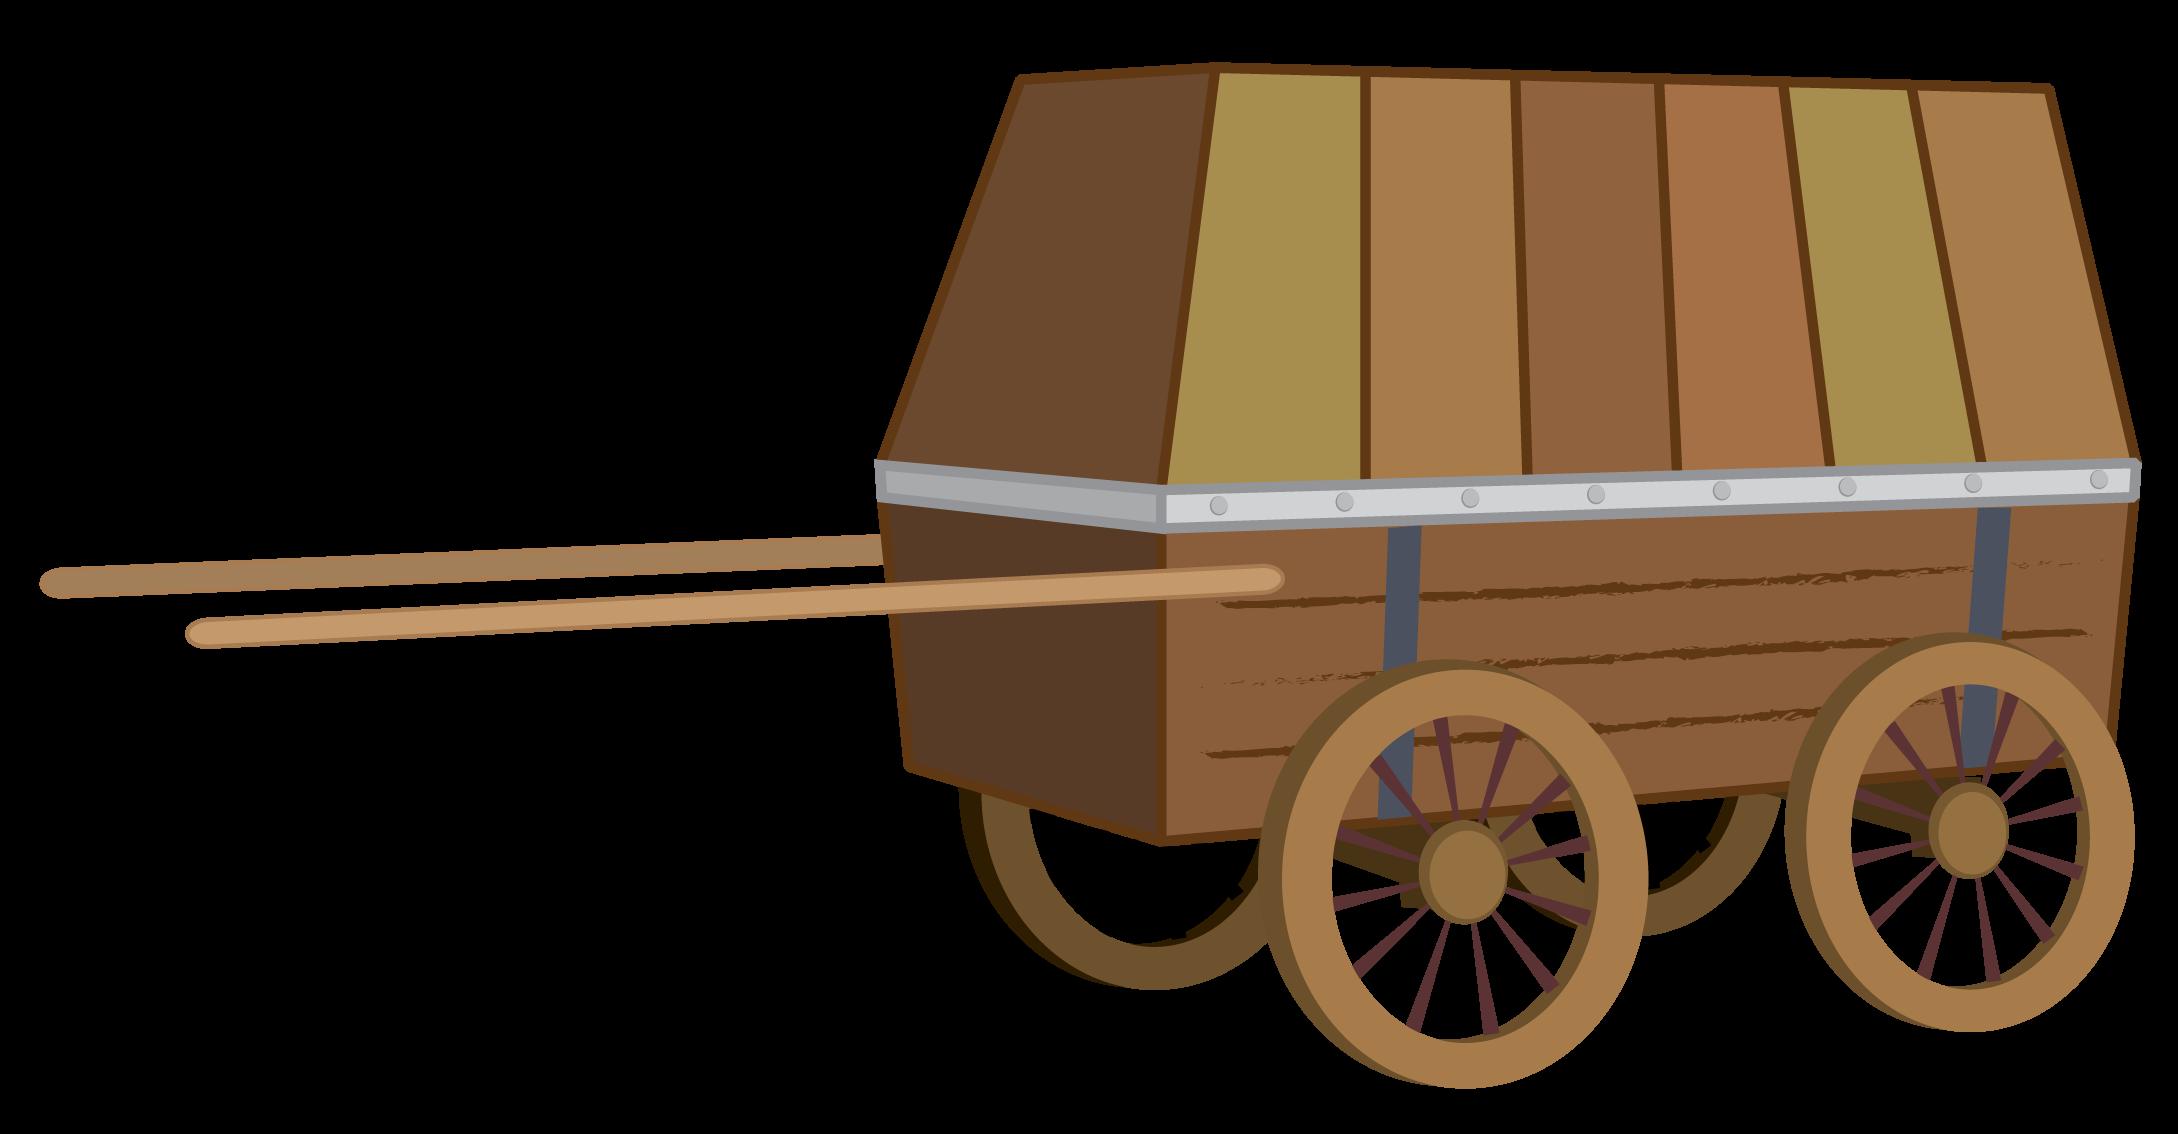 Wagon SVG by QTMarx on DeviantArt